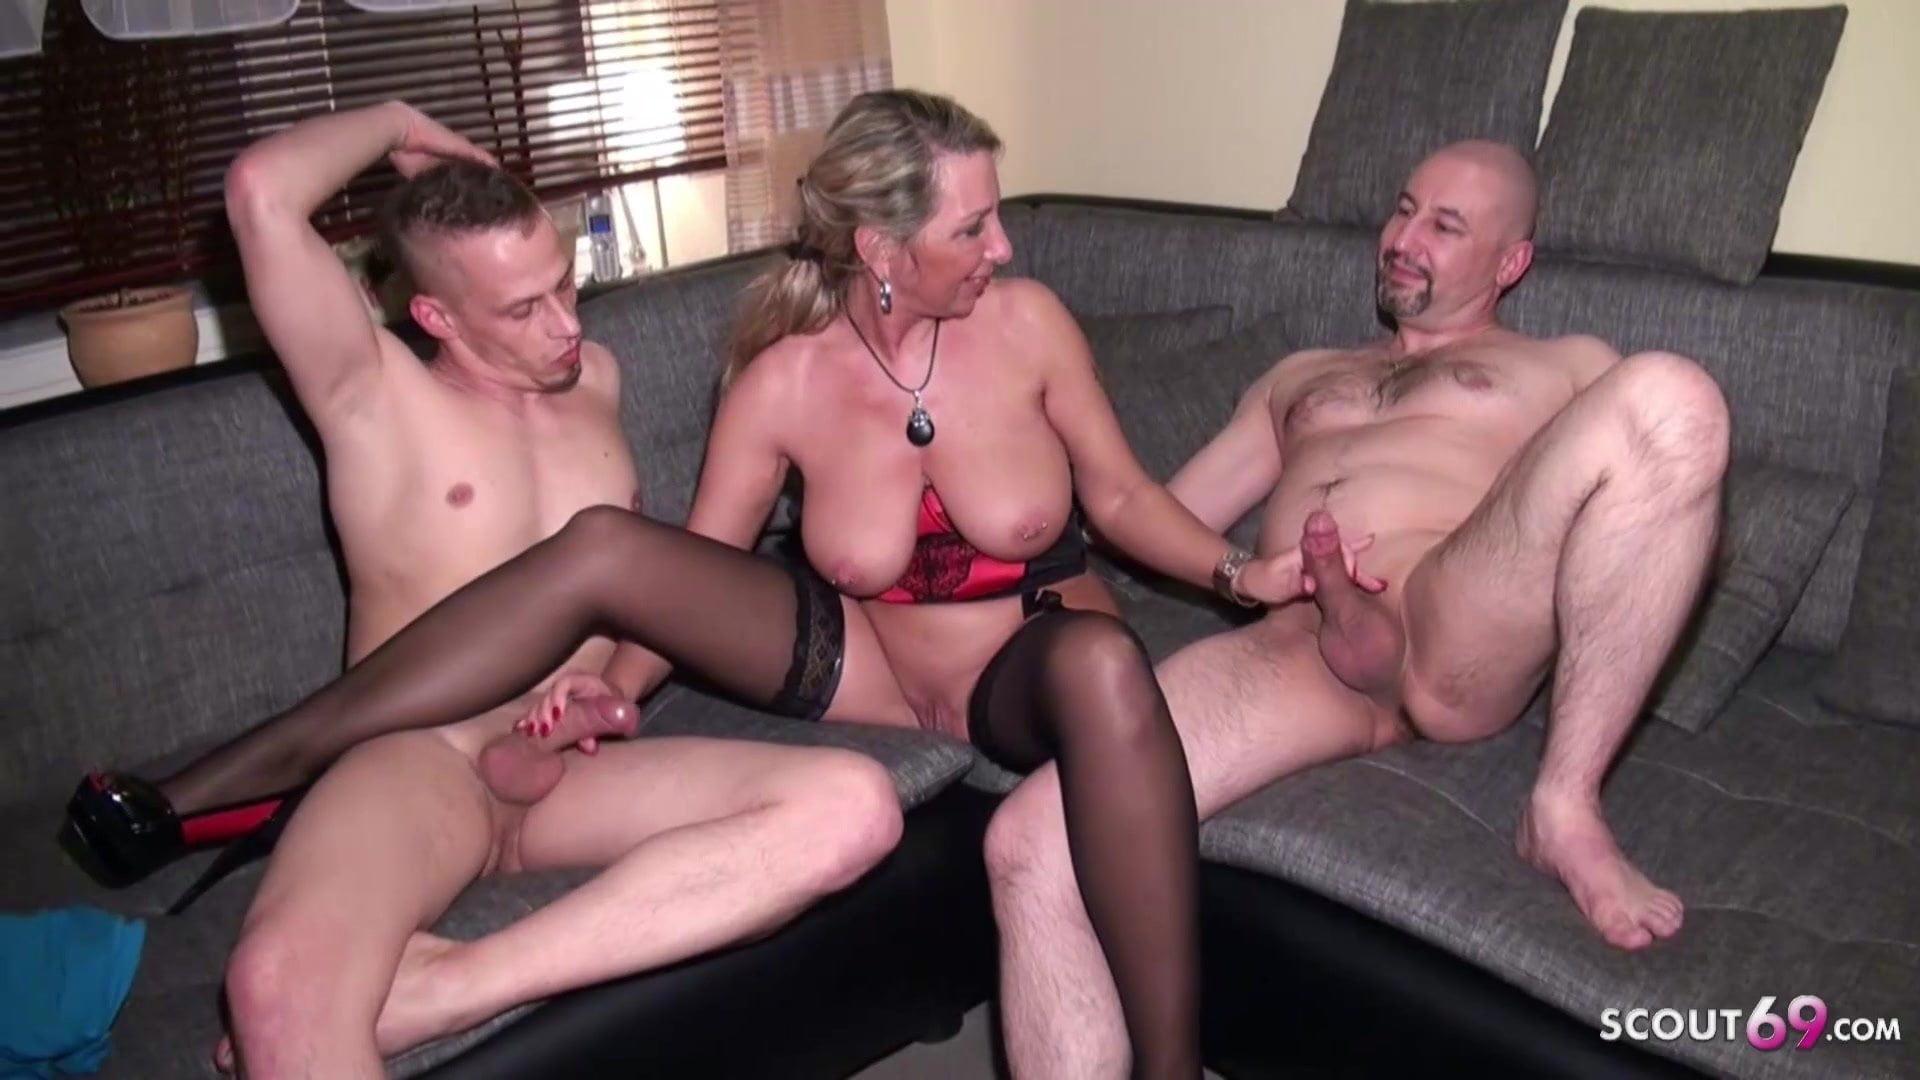 Husband and friend share wife